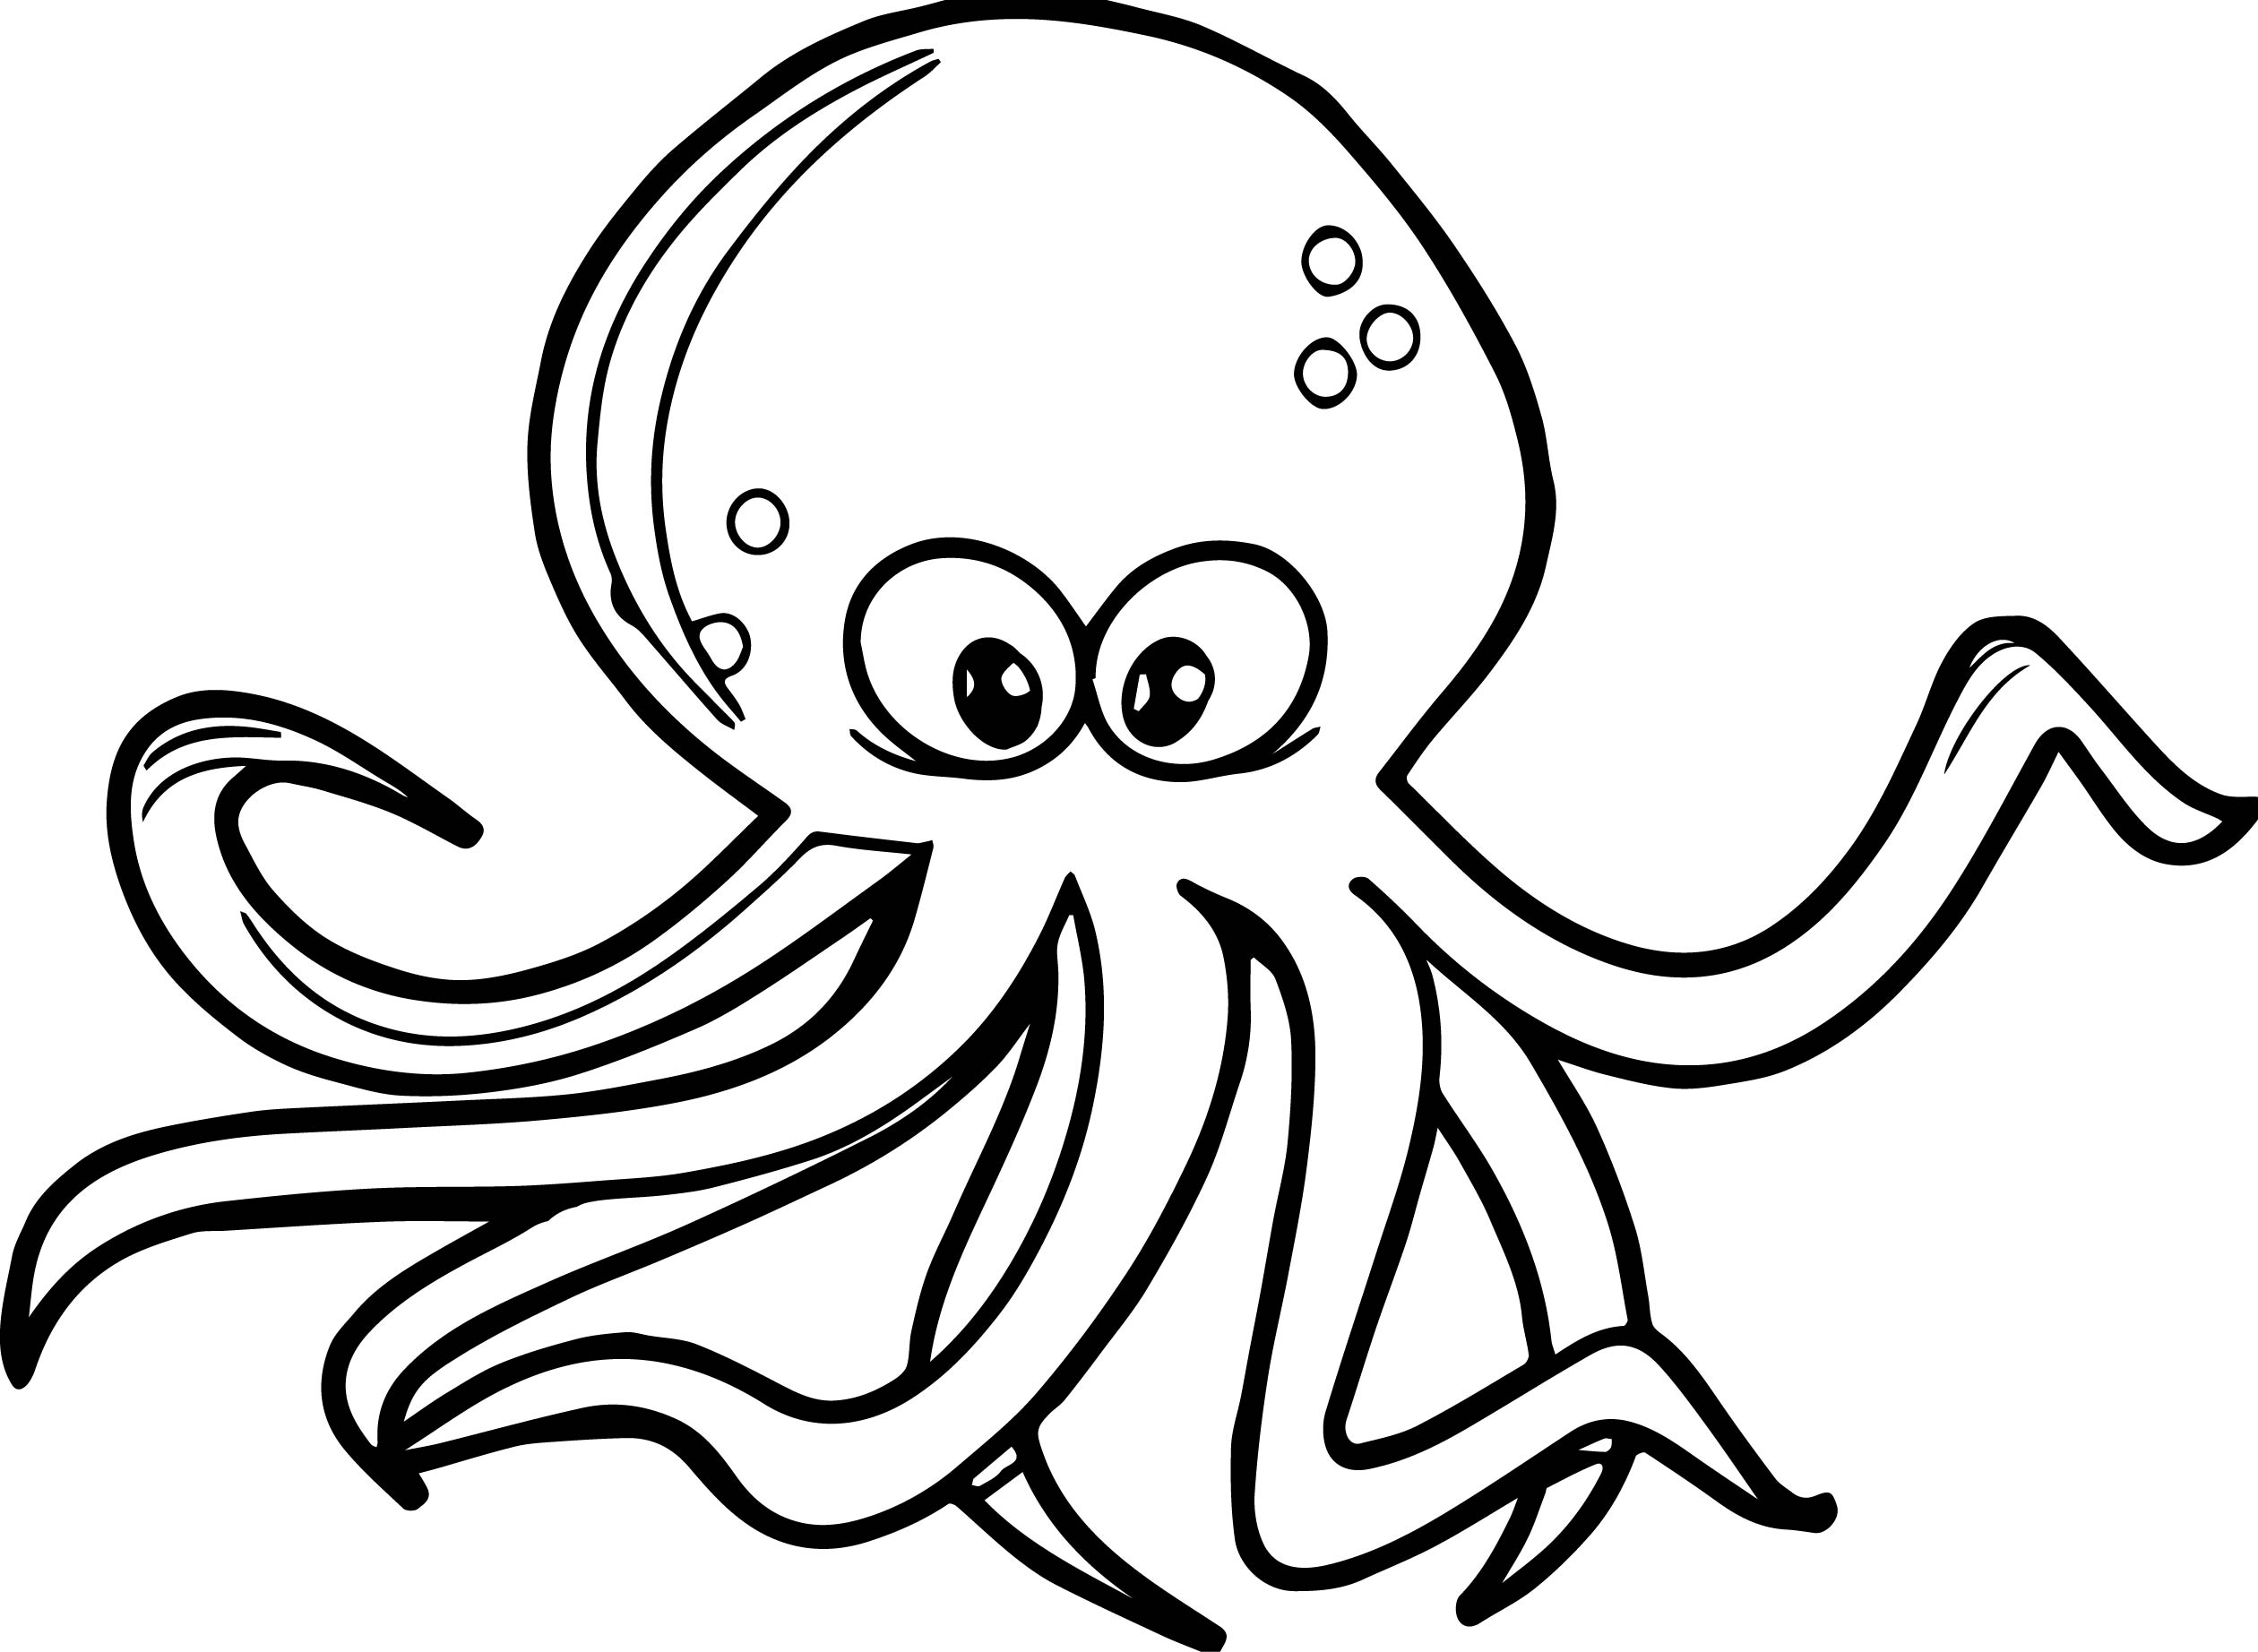 Octopus coloring #7, Download drawings